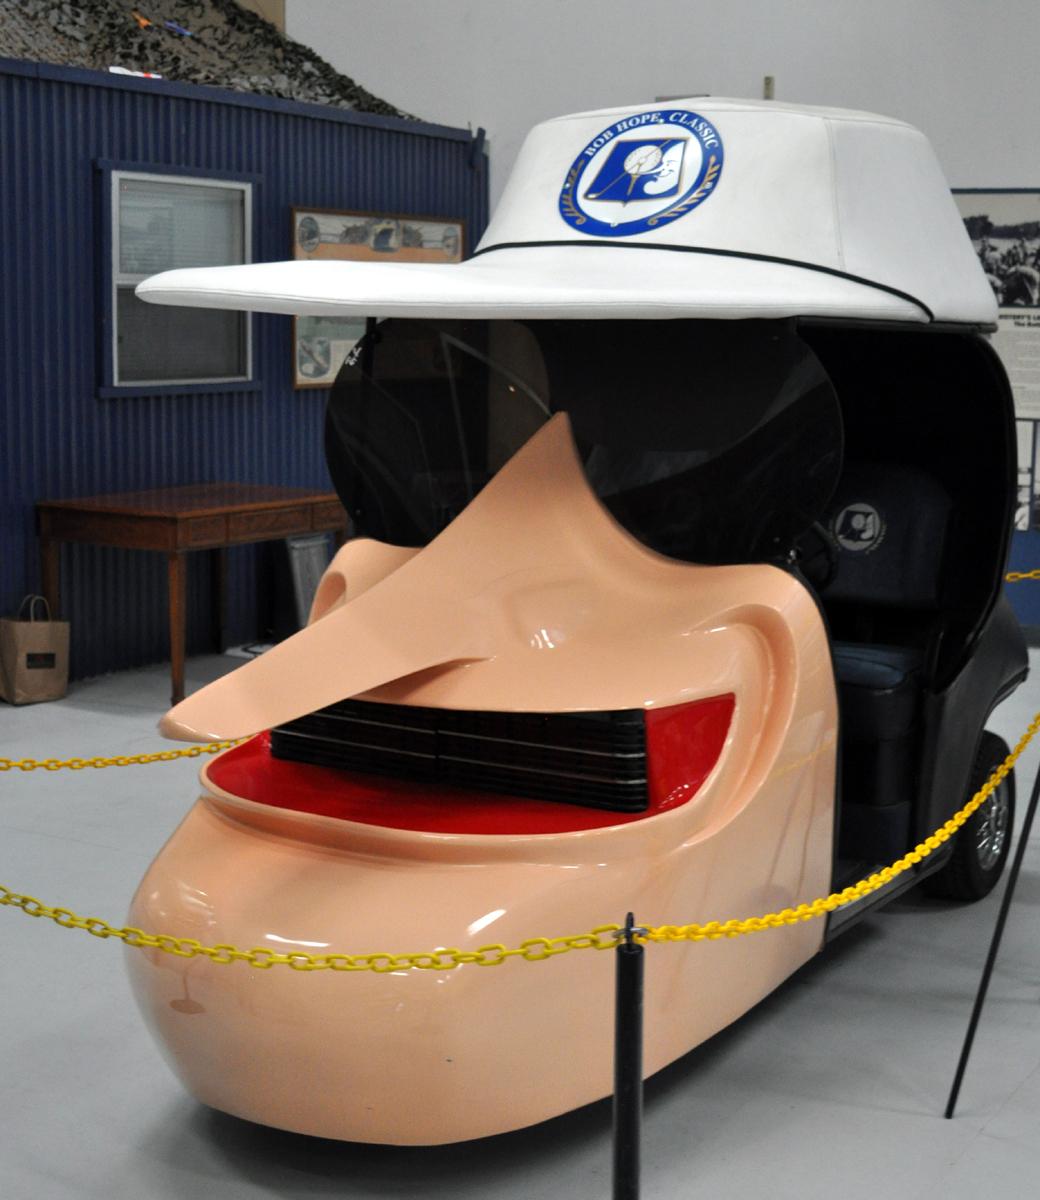 Just A Car Guy: Bob Hope's Cool Custom Golf Cart